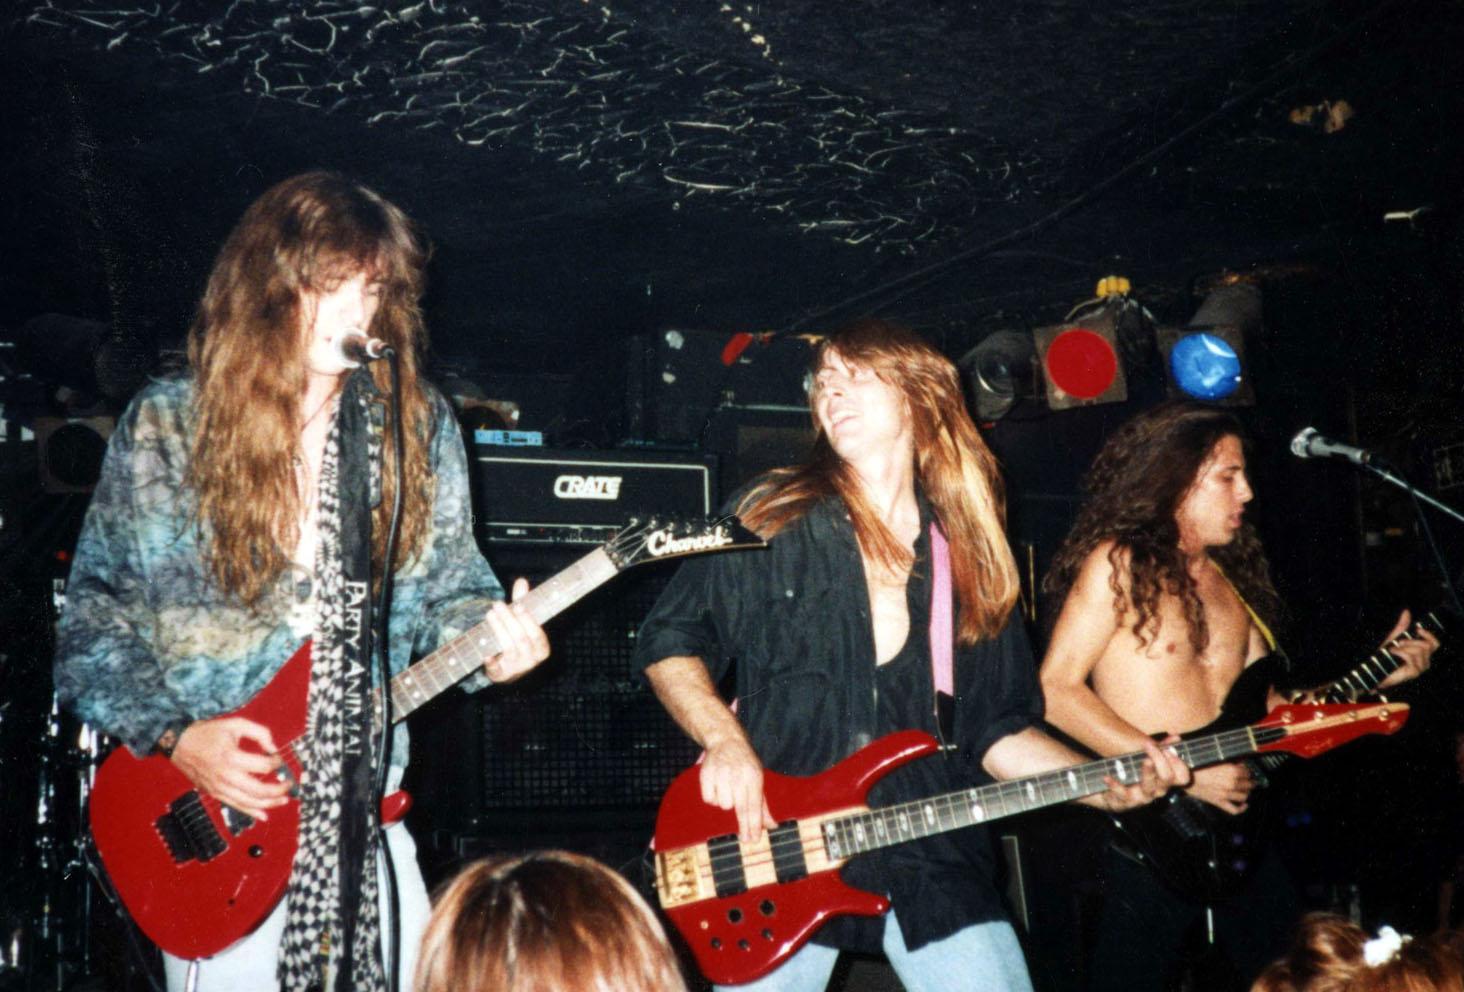 Dean Pressley, Jim Stuppy, and Will Hair